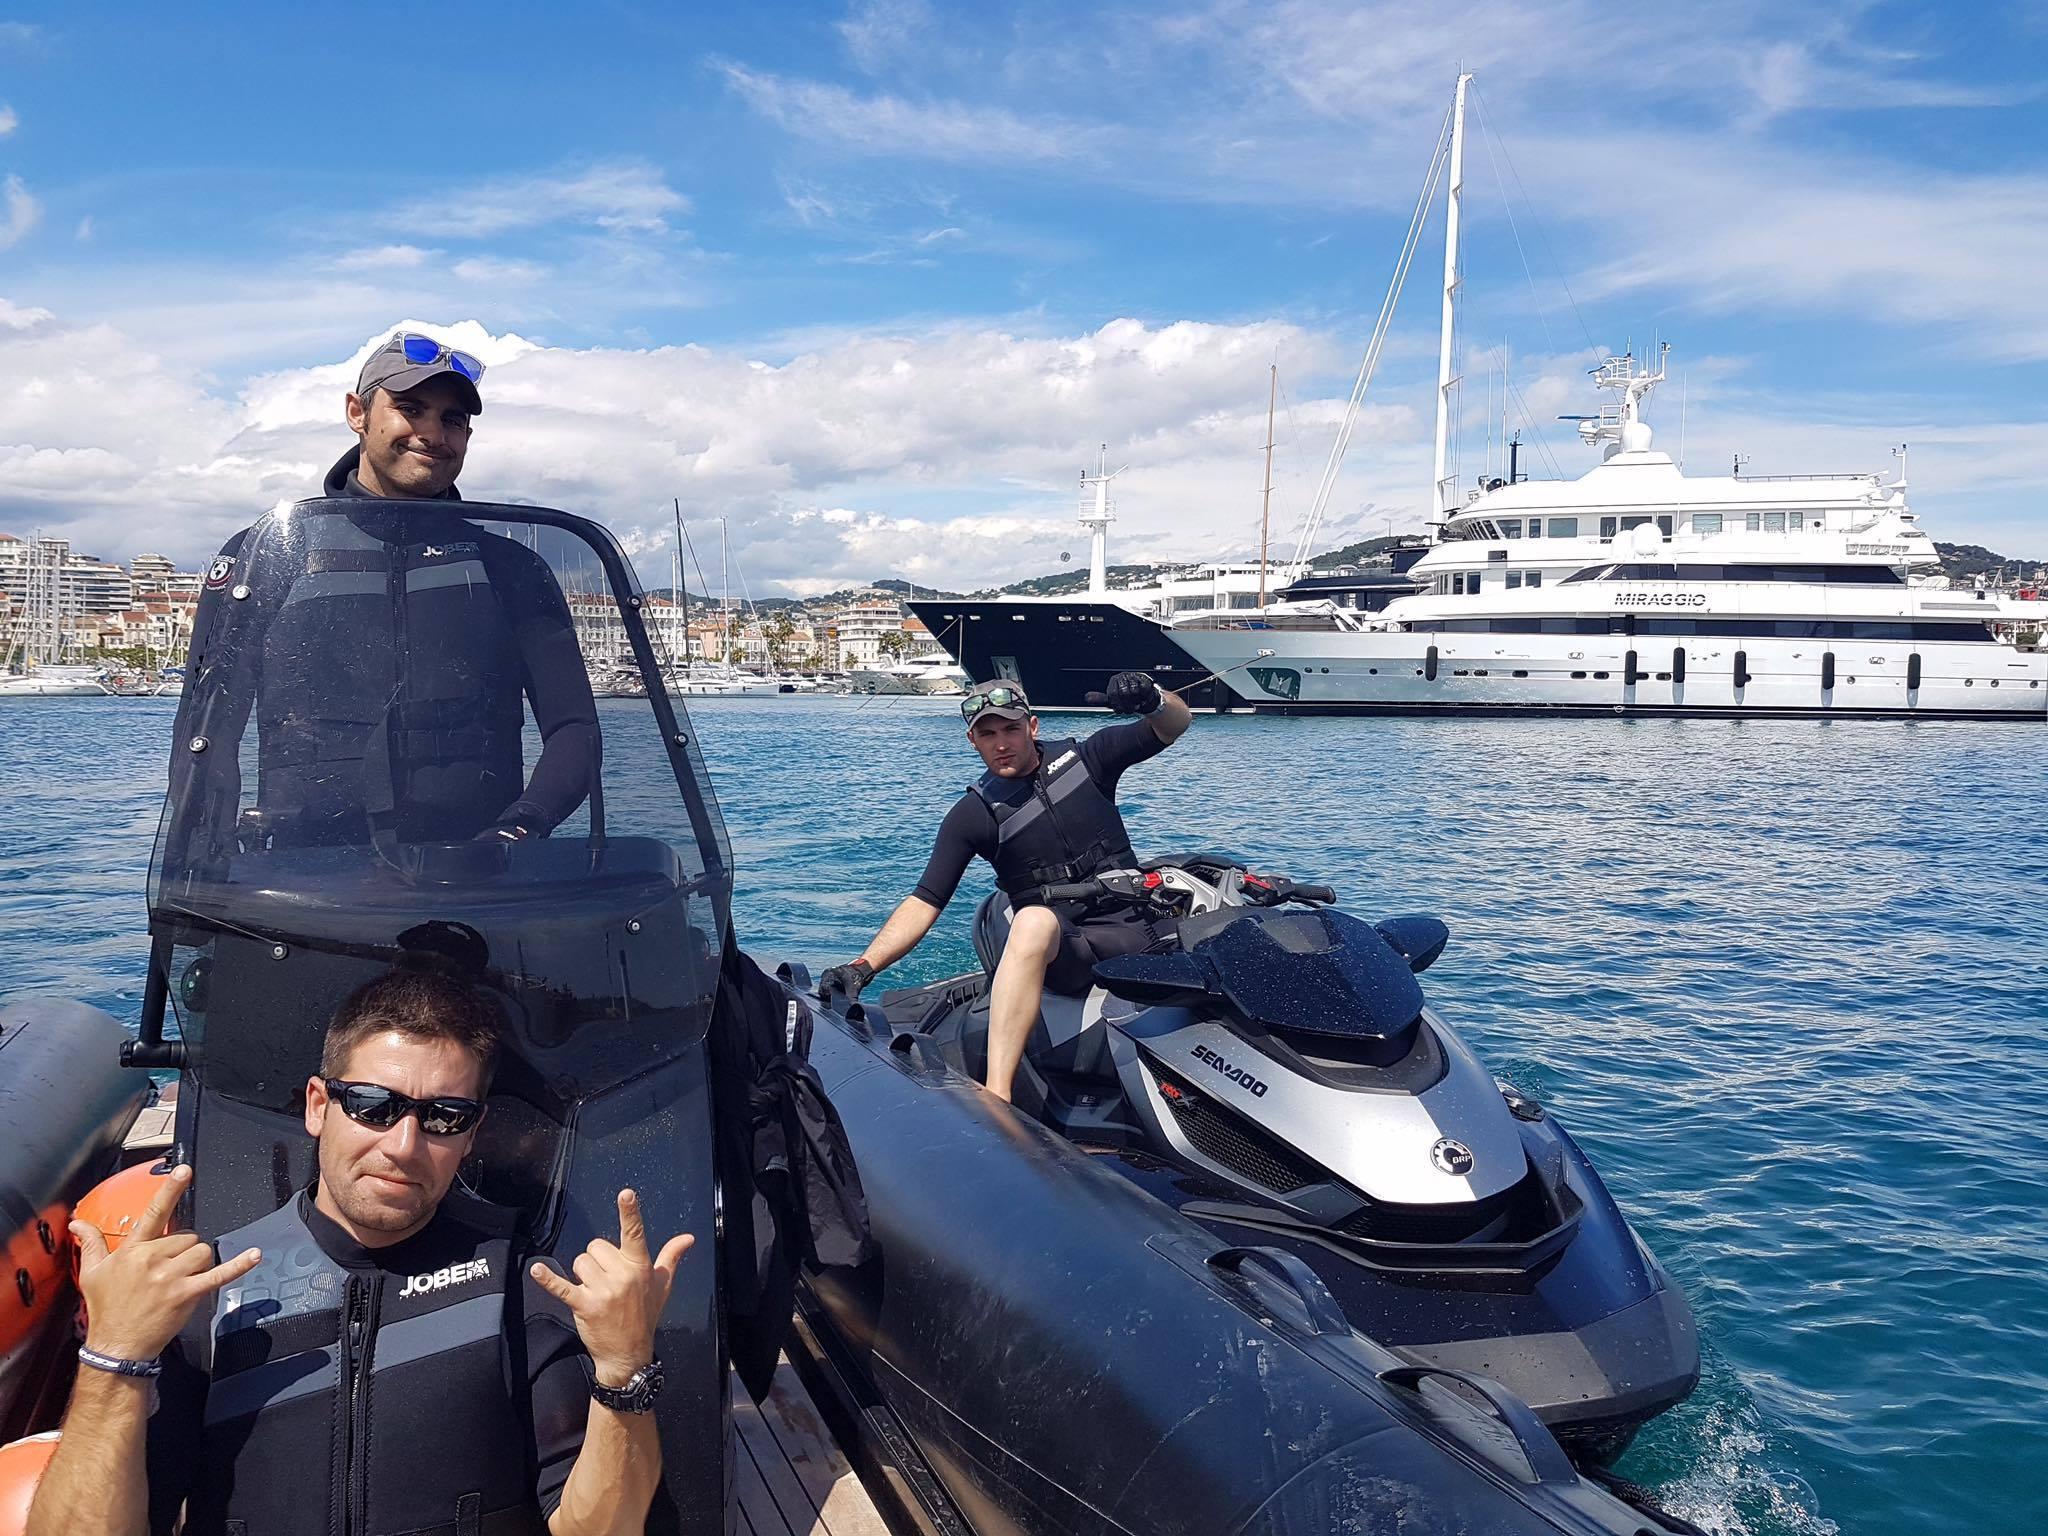 Onboard Crew RYA PWC Proficiency and Jetski Instructor Training at your location ©www.marine-education.co.uk